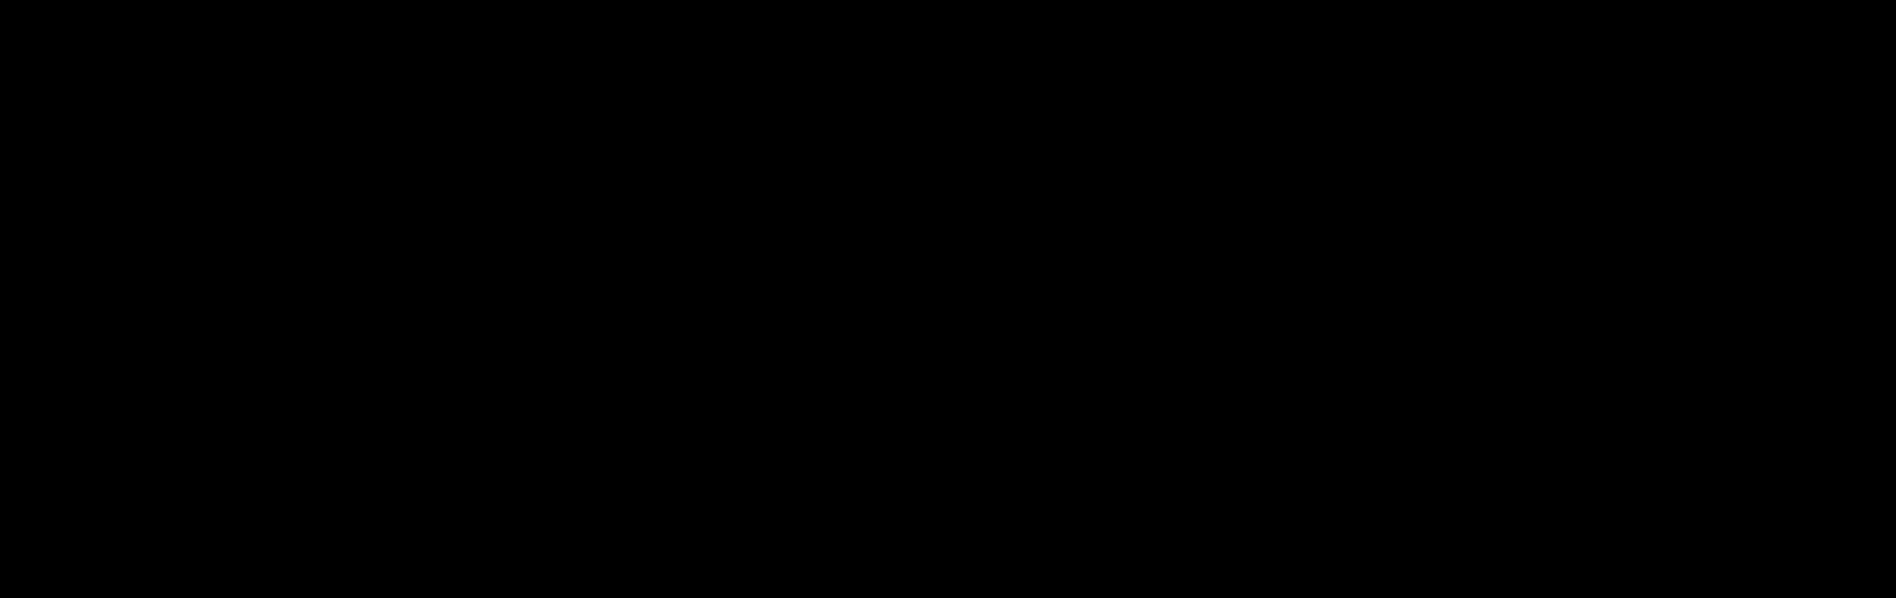 N -trans-(p-Coumaroyl)tyramine-d<sub>4</sub>